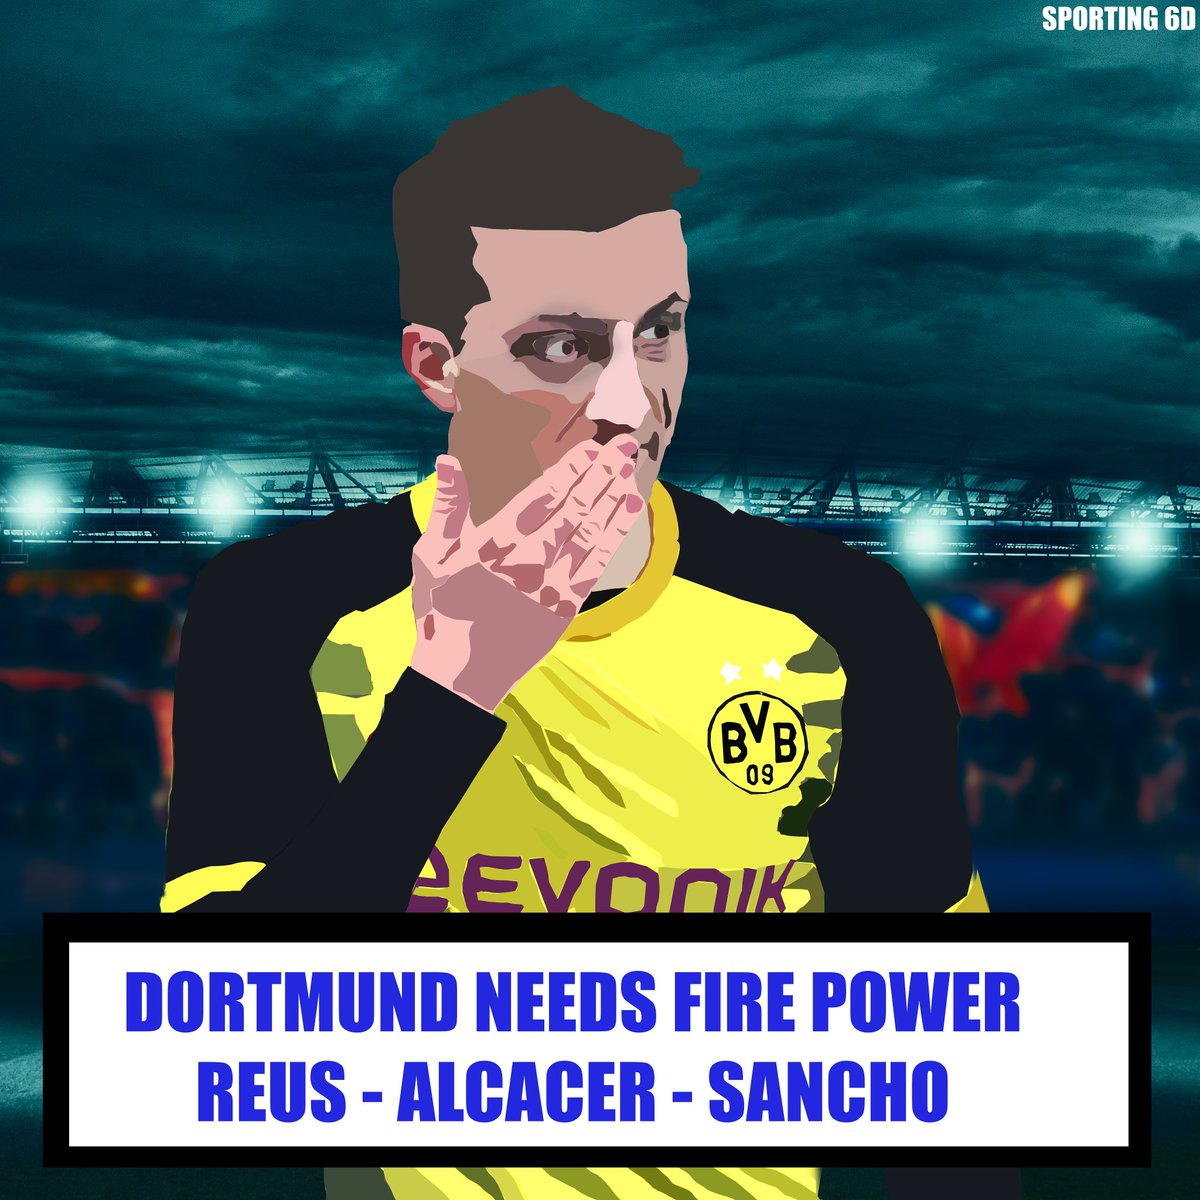 #Dortmund need a big month with a galore of #goals to challenge #Bayern again.#Germany #German #reus #sancho #BVB #bvb09 #borussia #hejabvb #nurderbvb #FCBayern #EURO2020 #Fussball #neur #kroos #DFB #dfbteam #talents #gnabry #lewandowski #euro #alcacer #Kimmich #UCL #Bundesliga